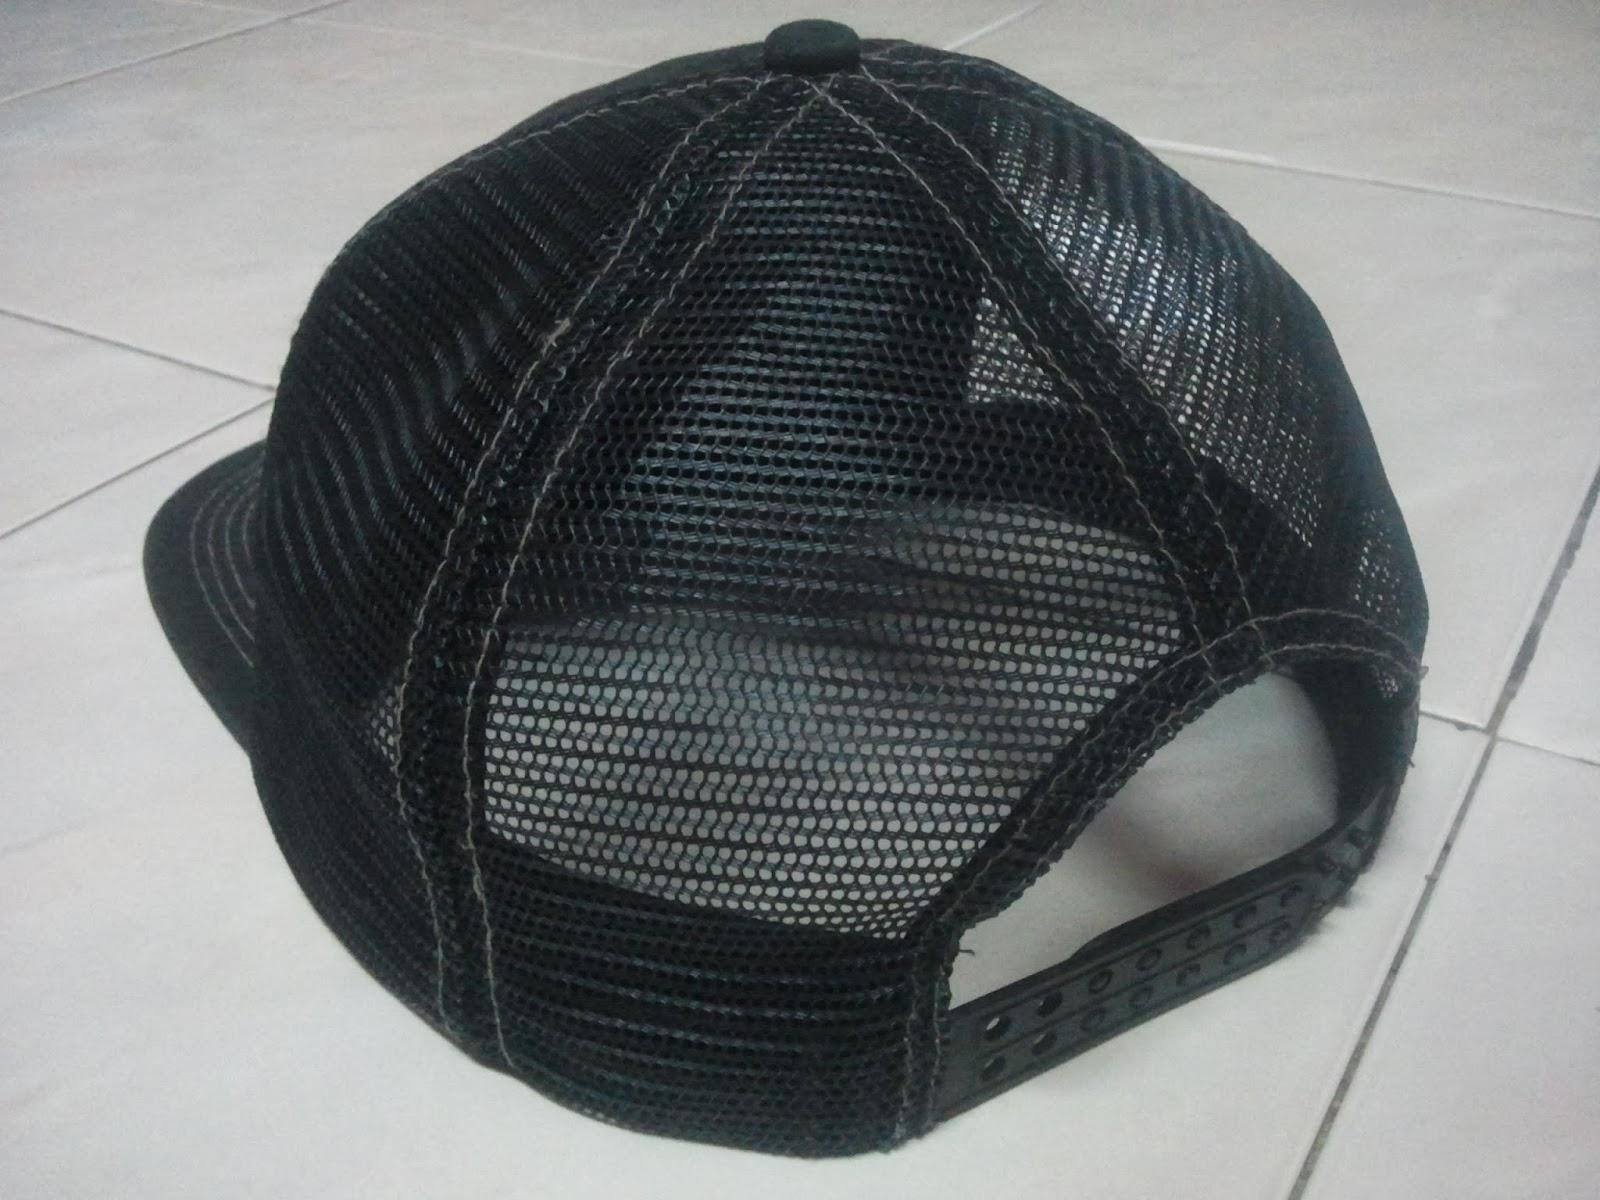 d5465632b32 (WL-1976) Logo Embroidered Mesh Snapback By Thrasher Magazine Headwear.  Price   Sold Color   Dark Gray Black